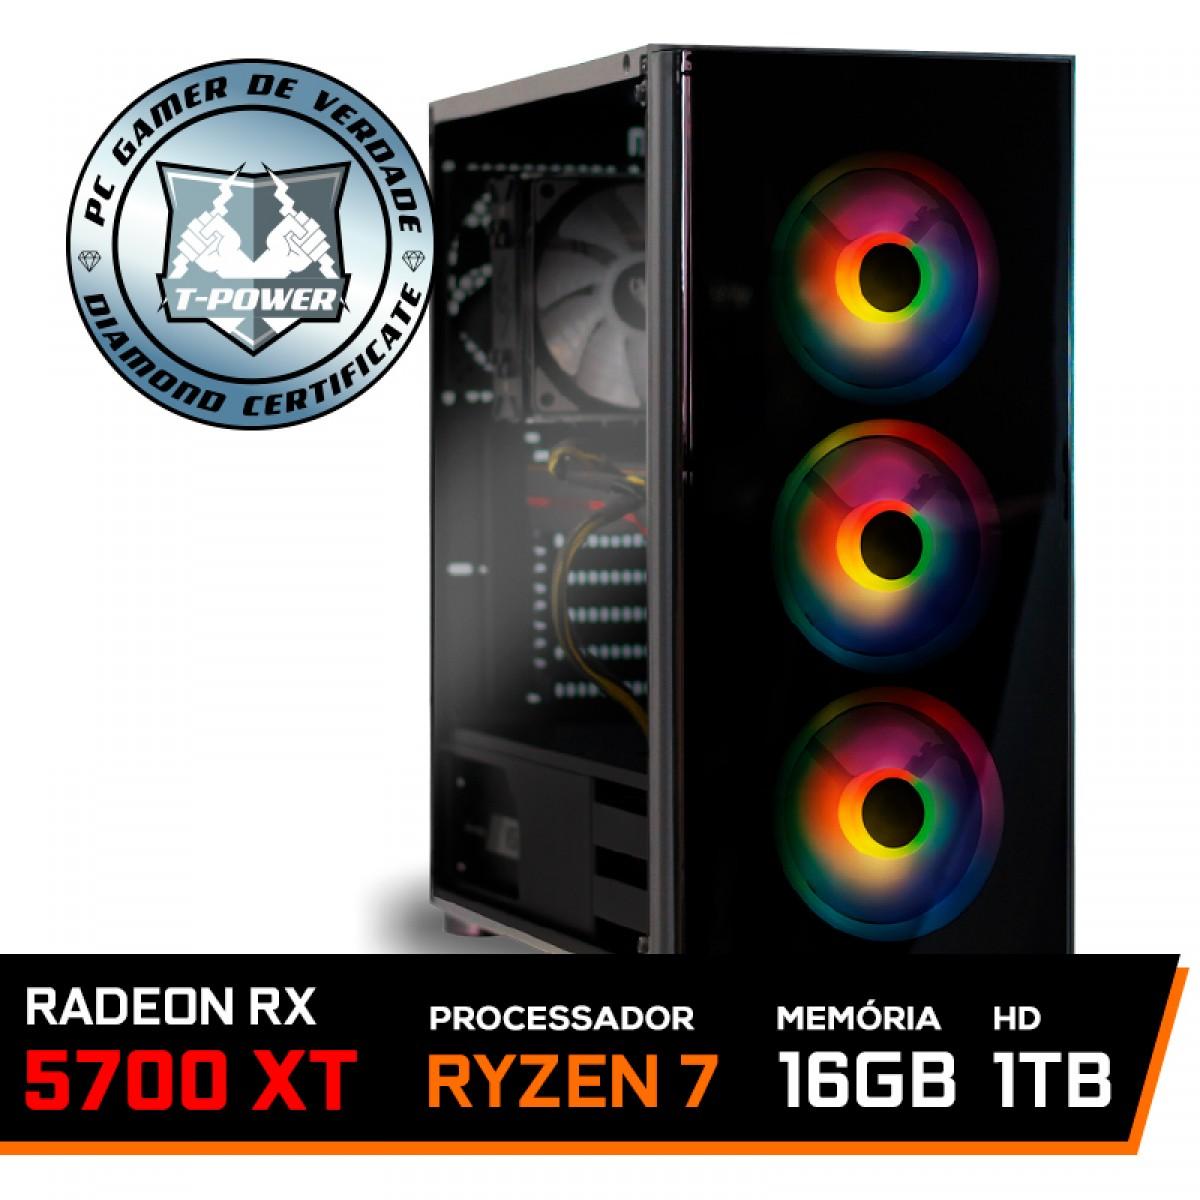 Pc Gamer T-Power Destroyer Lvl-3 AMD Ryzen 7 3800X / Radeon RX 5700 XT 8GB / DDR4 16GB / HD 1TB / 600W